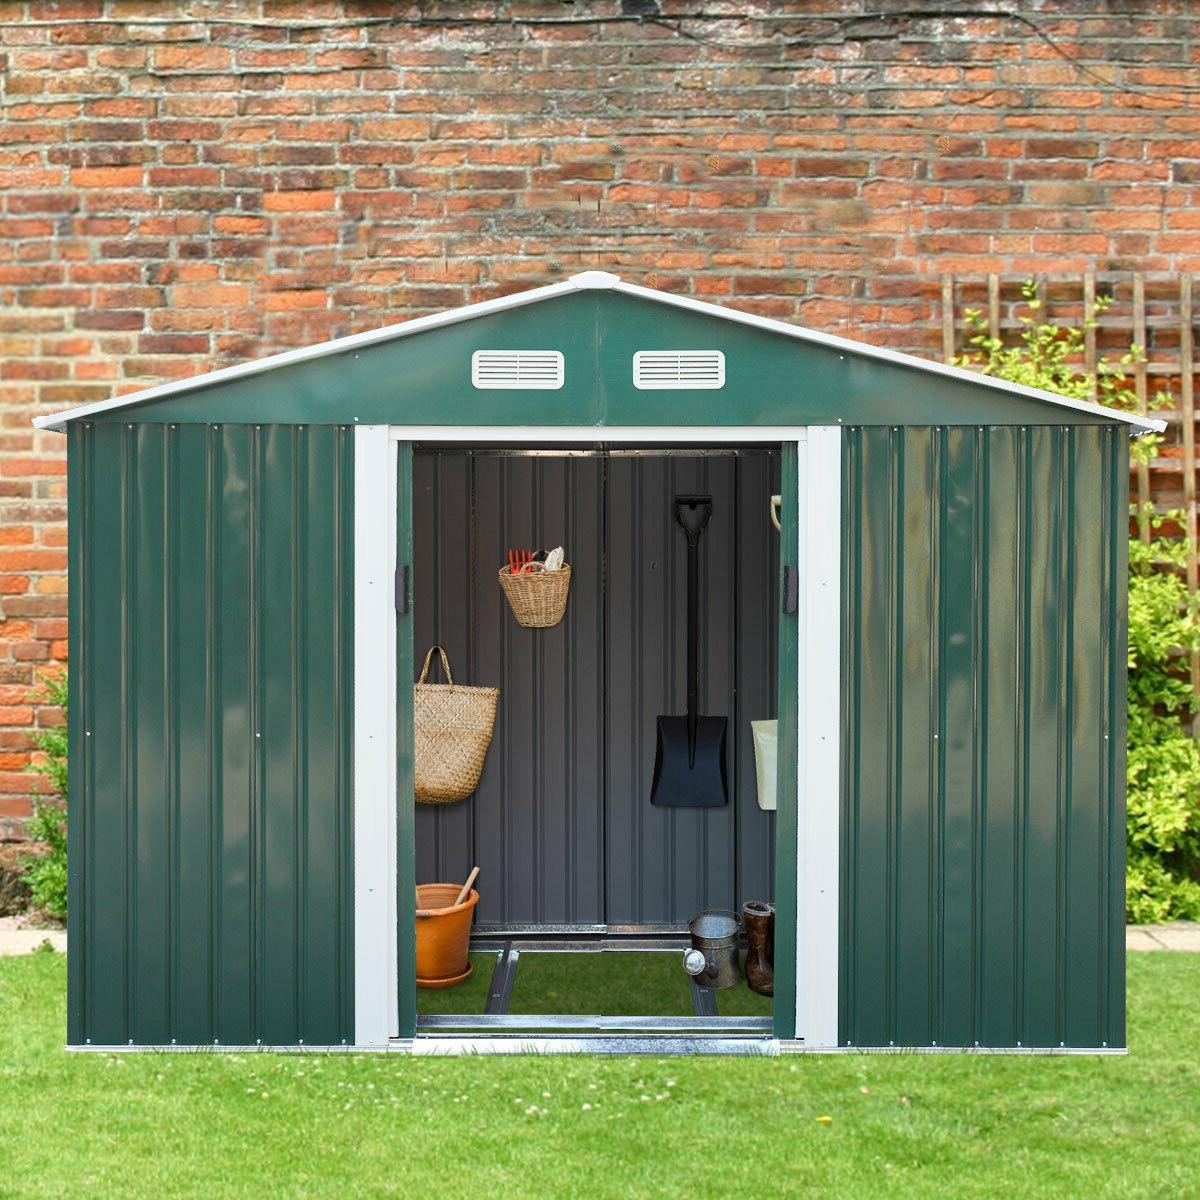 9x6x6ft Garden Storage Shed Tool House Sliding Door Backyard